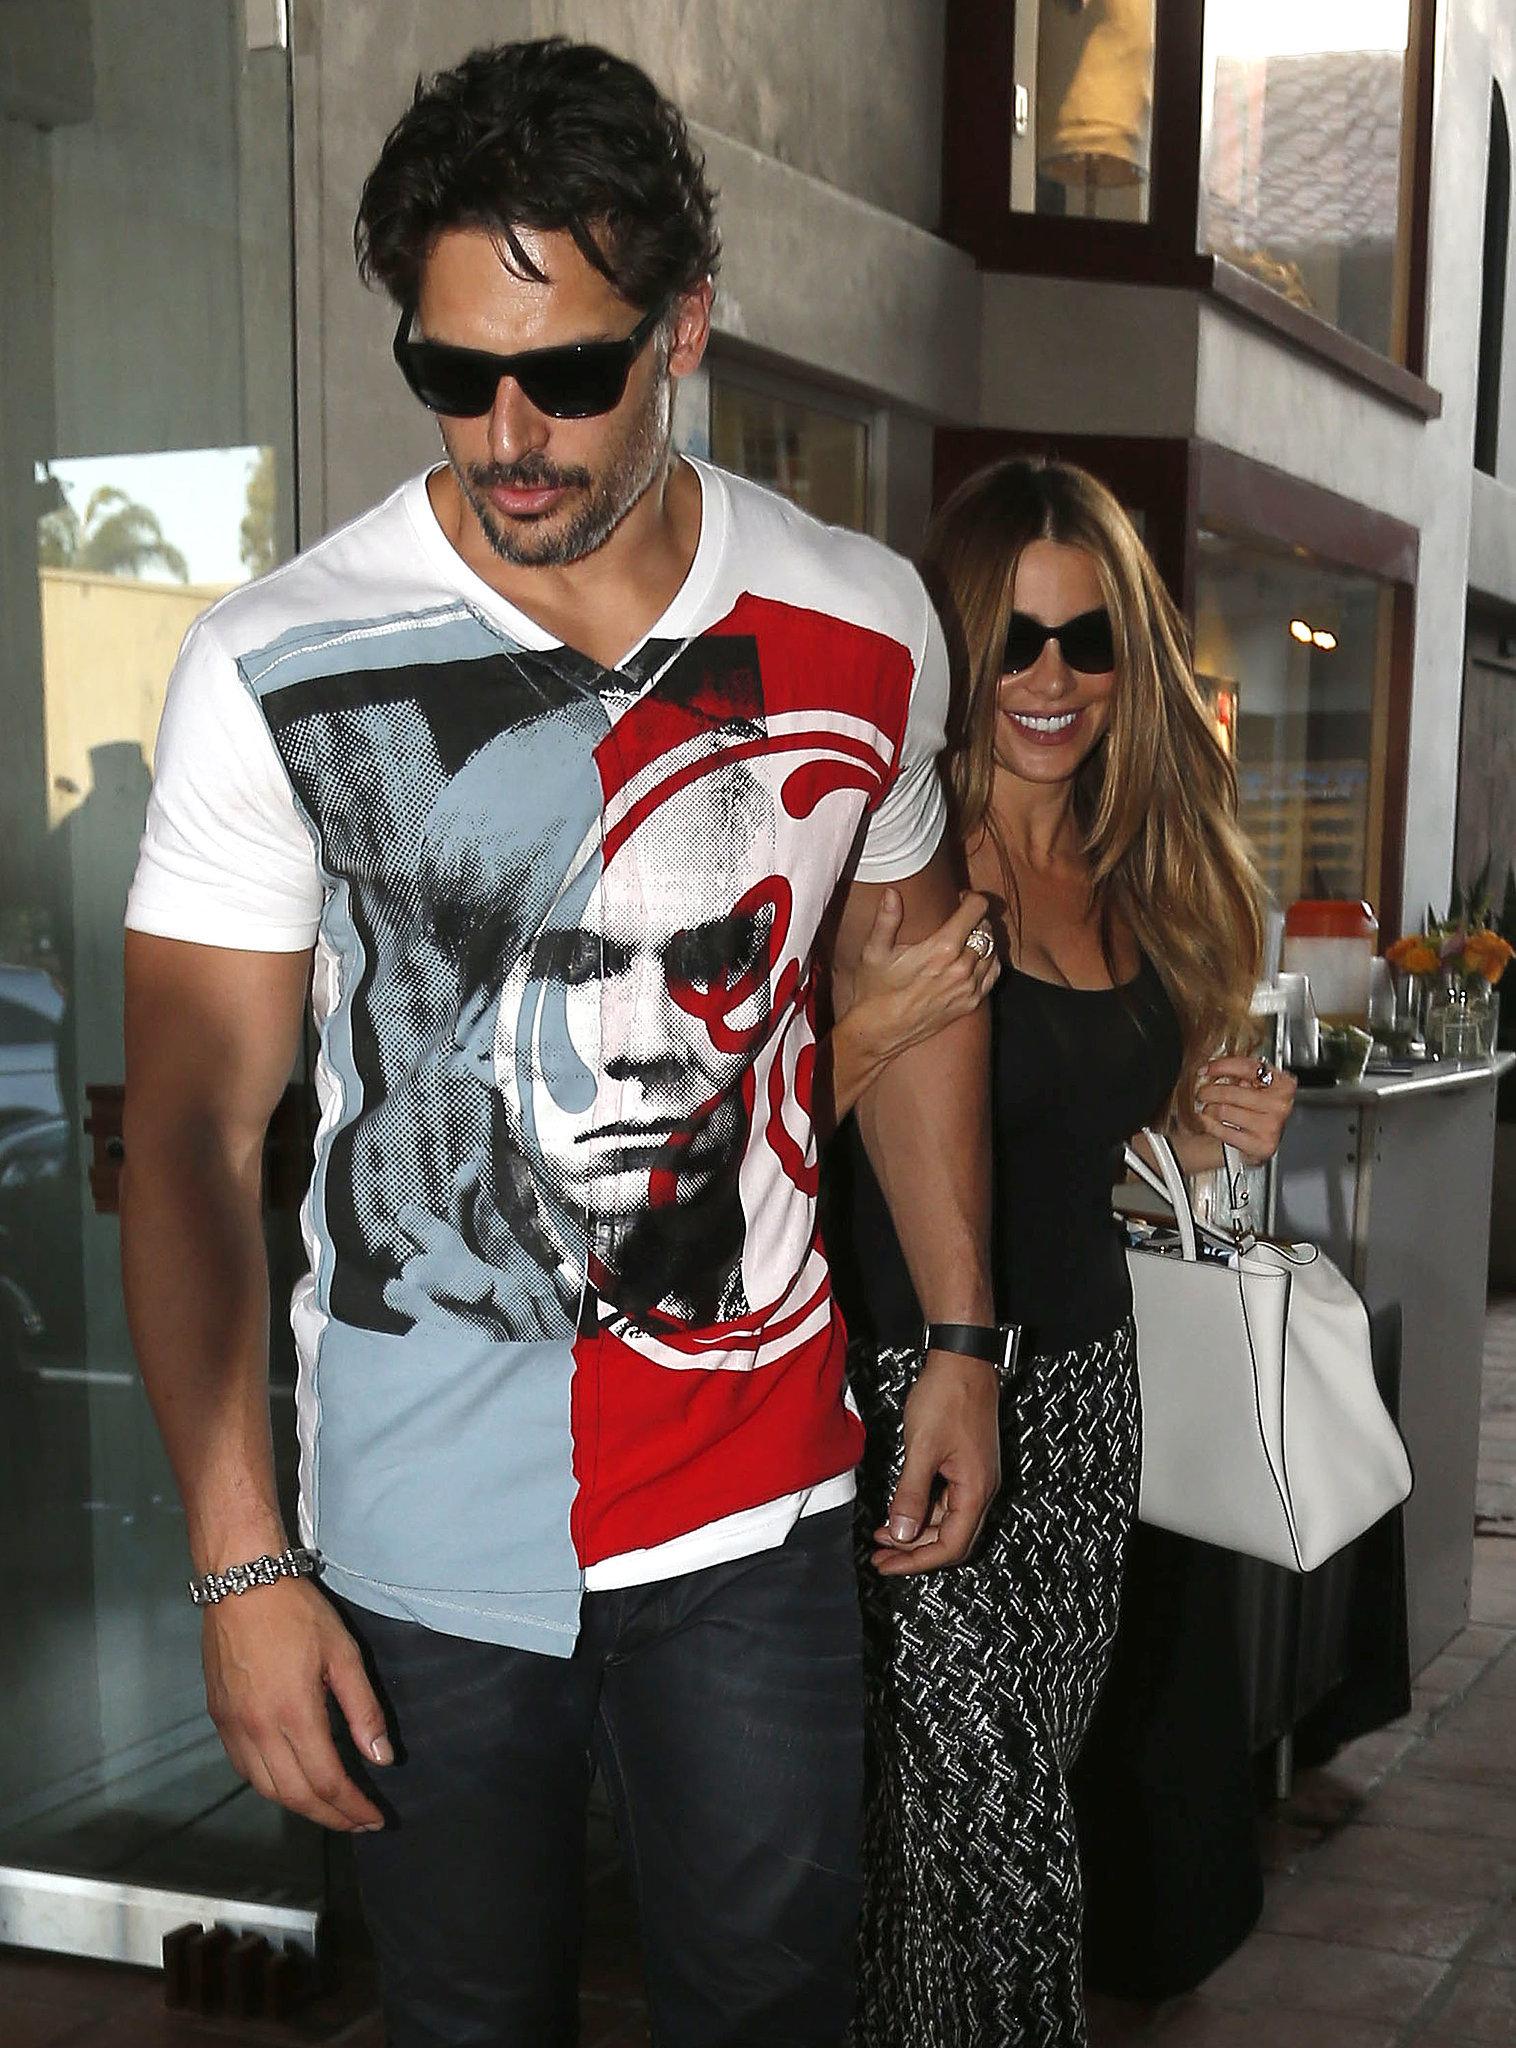 Sofia Vergara and Joe Manganiello went shopping in Malibu, CA, on Saturday.